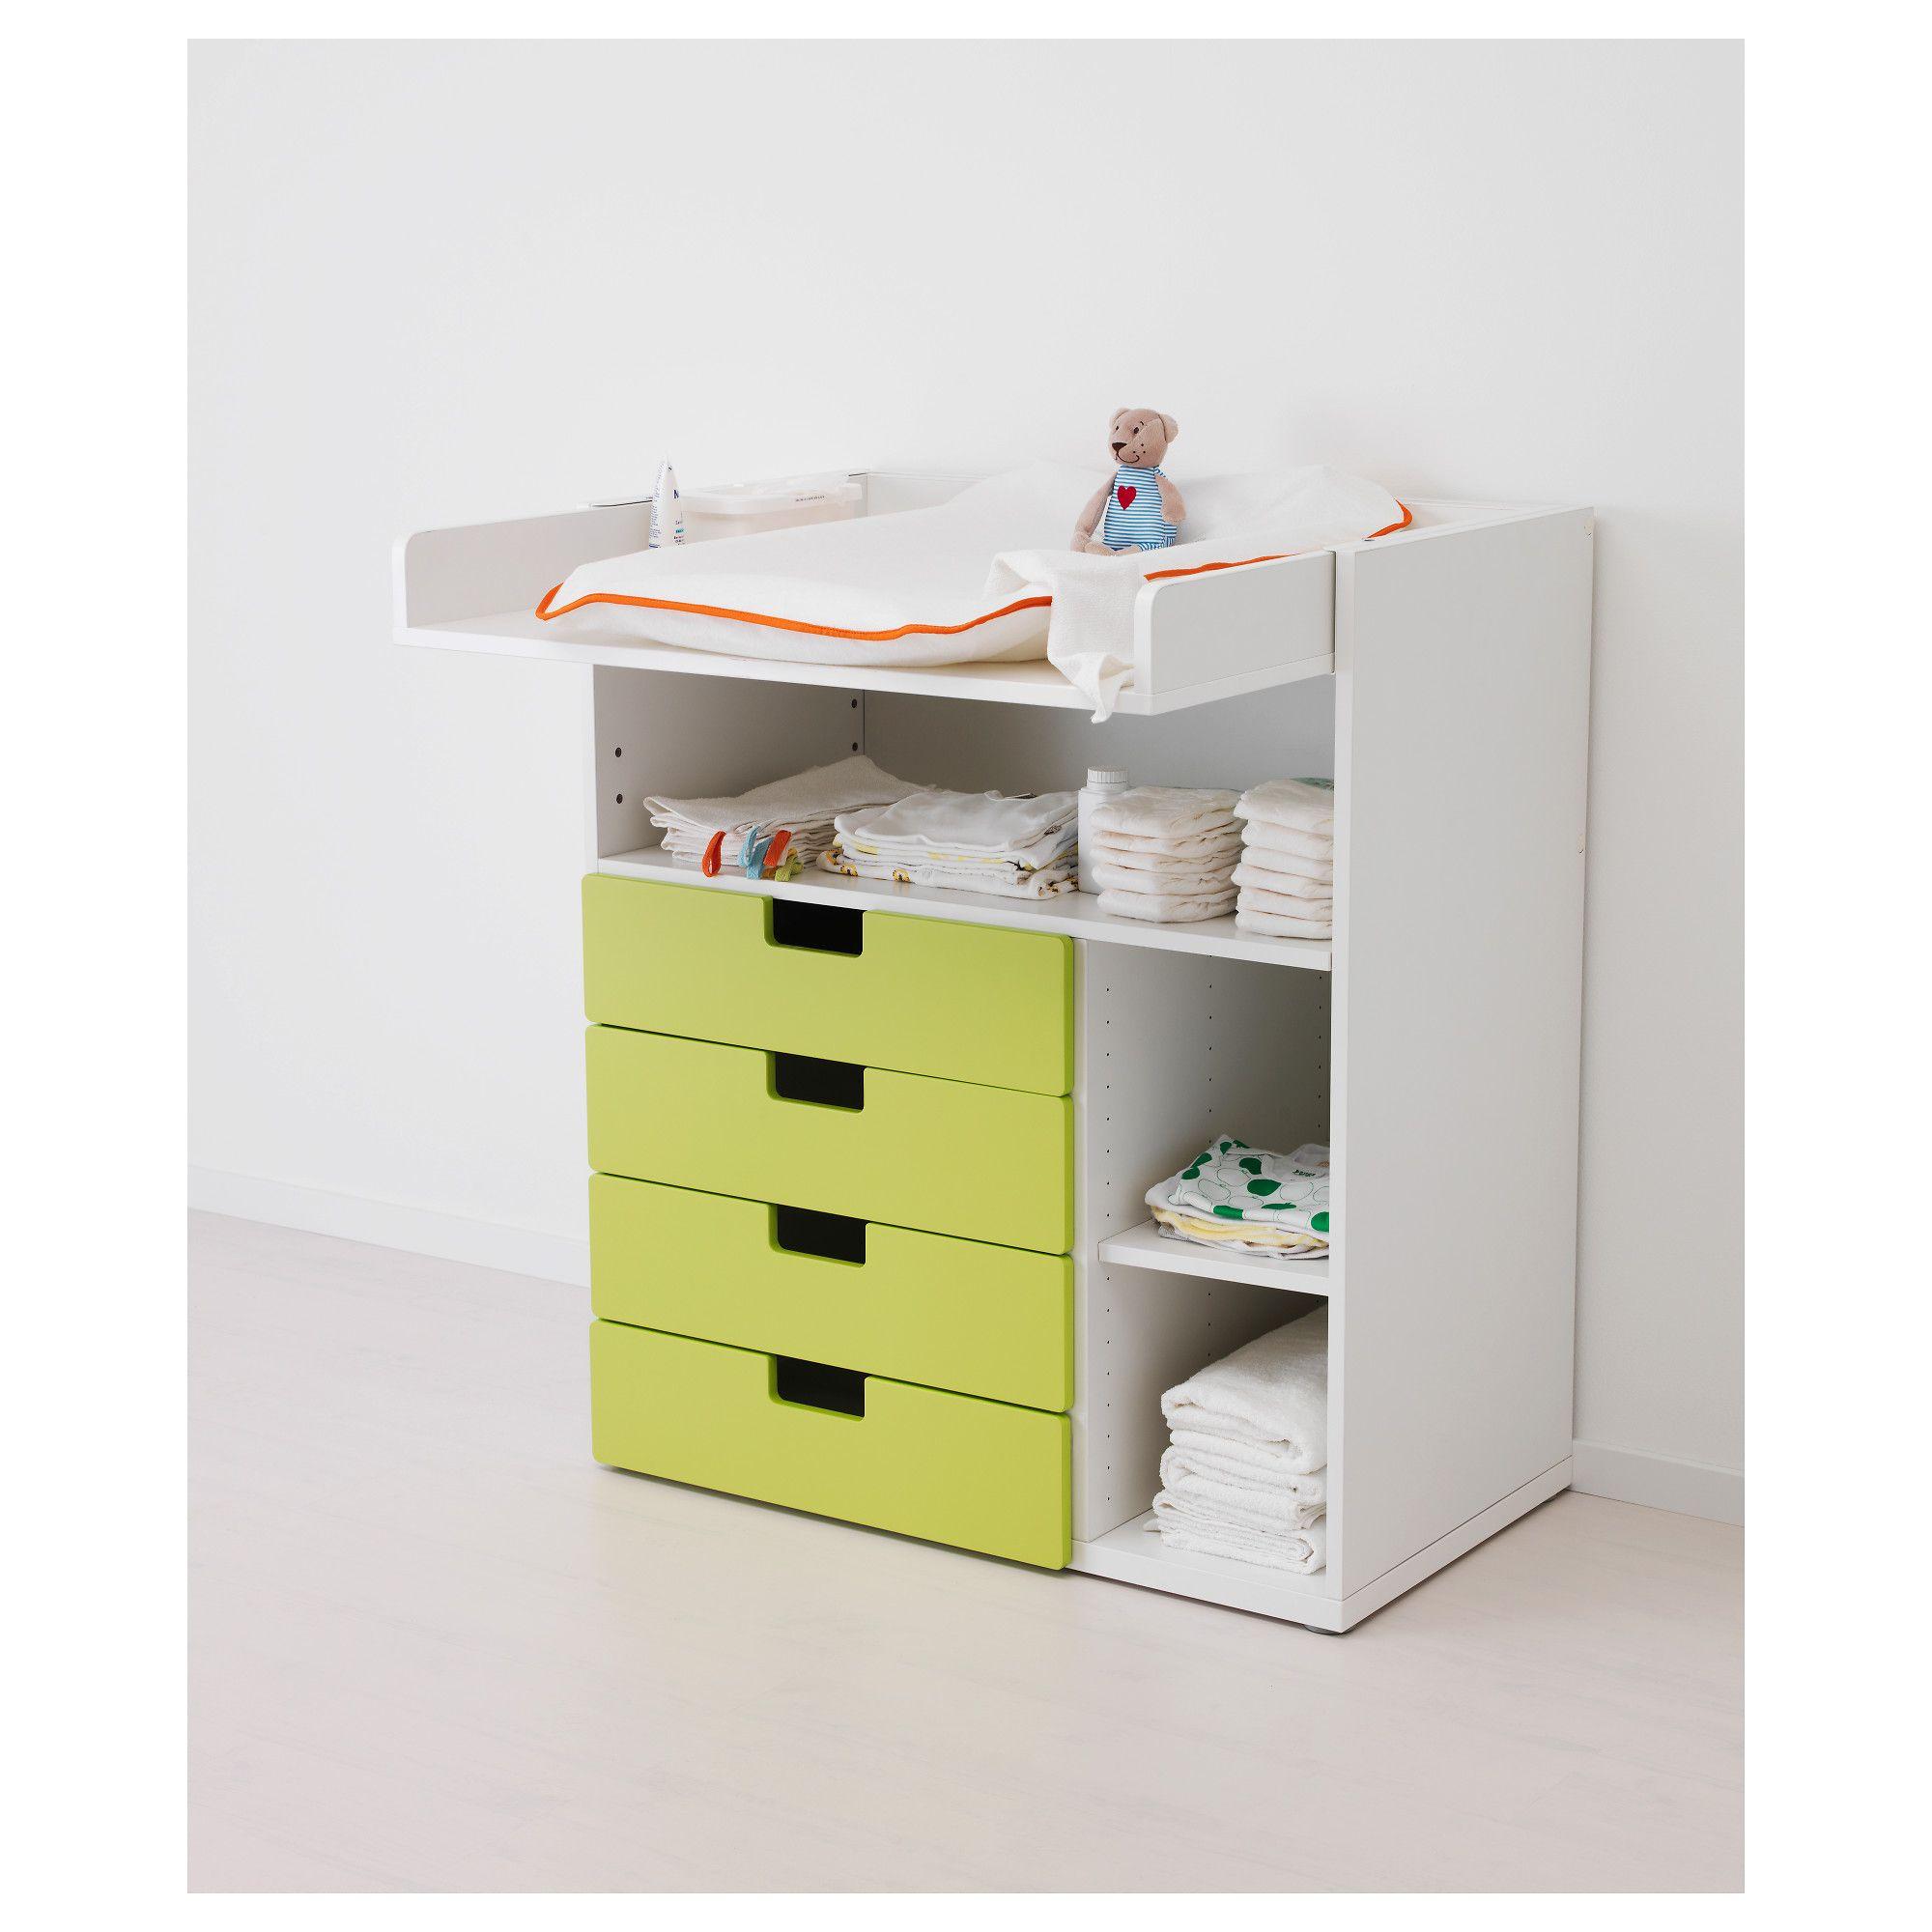 55d0d02a6163 STUVA маса за повиване/бюро, бяло, Маси за повиване и грижи за ...